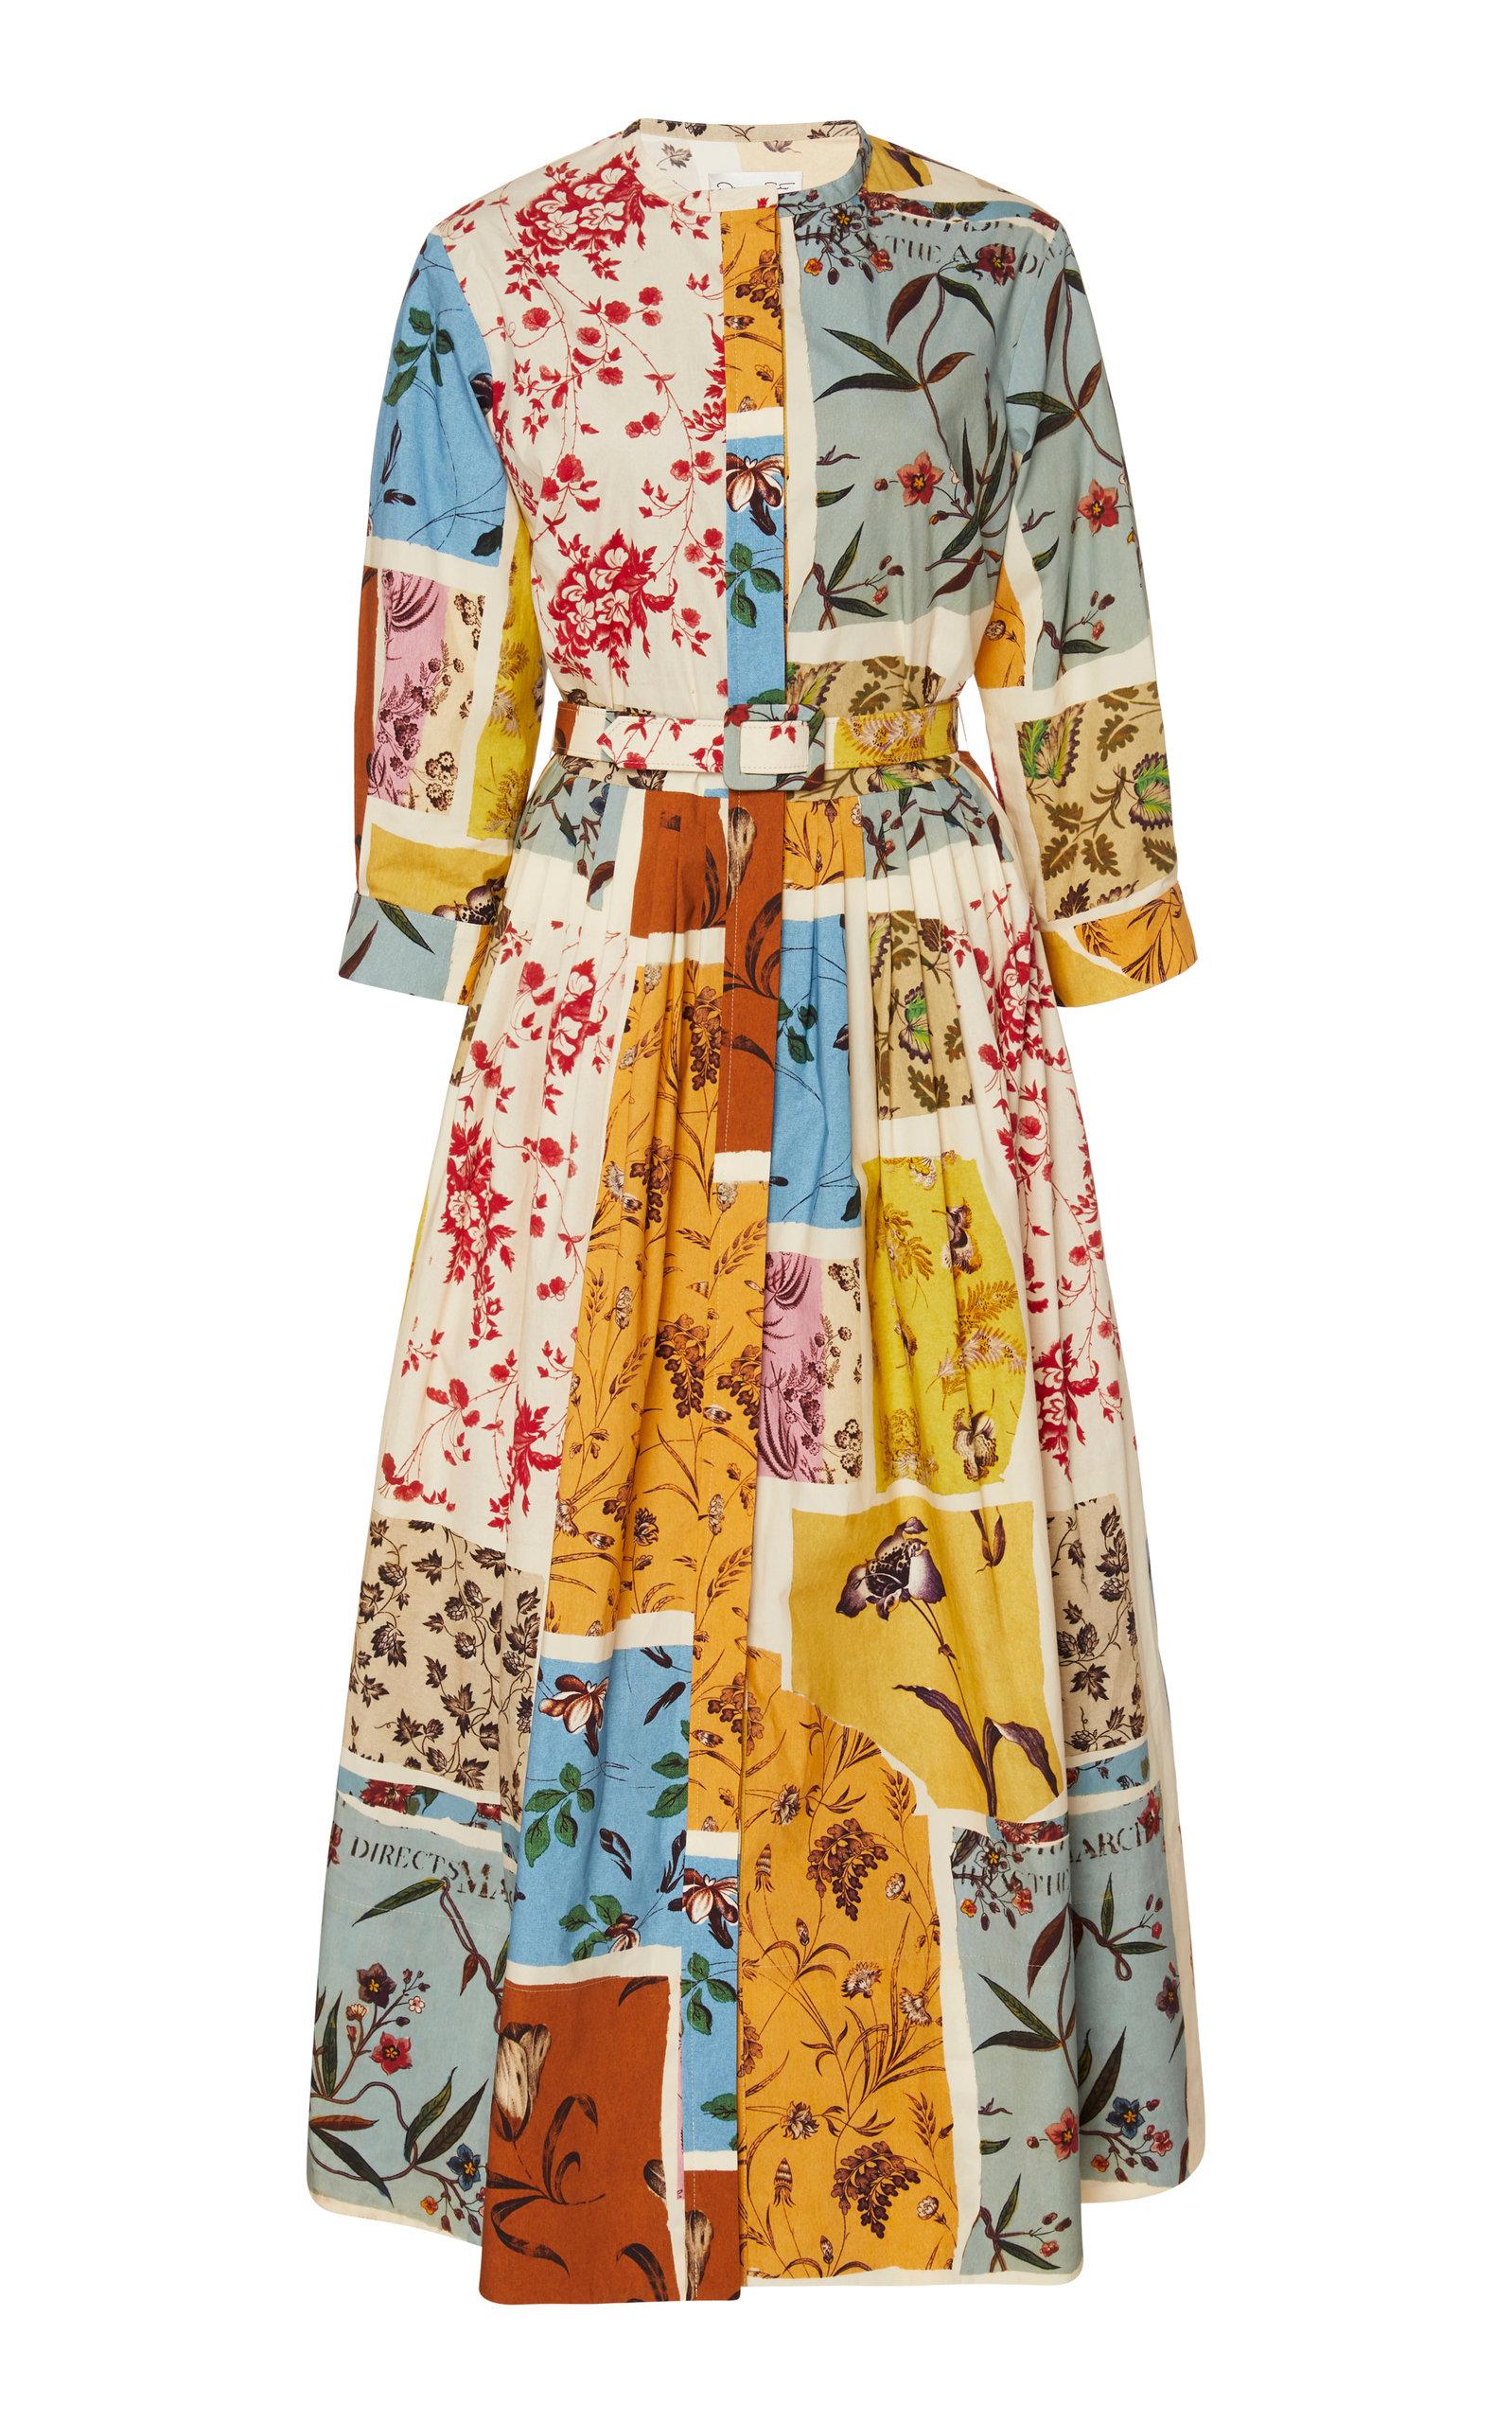 Buy Oscar de la Renta Belted Floral Cotton Poplin Shirt Dress online, shop Oscar de la Renta at the best price